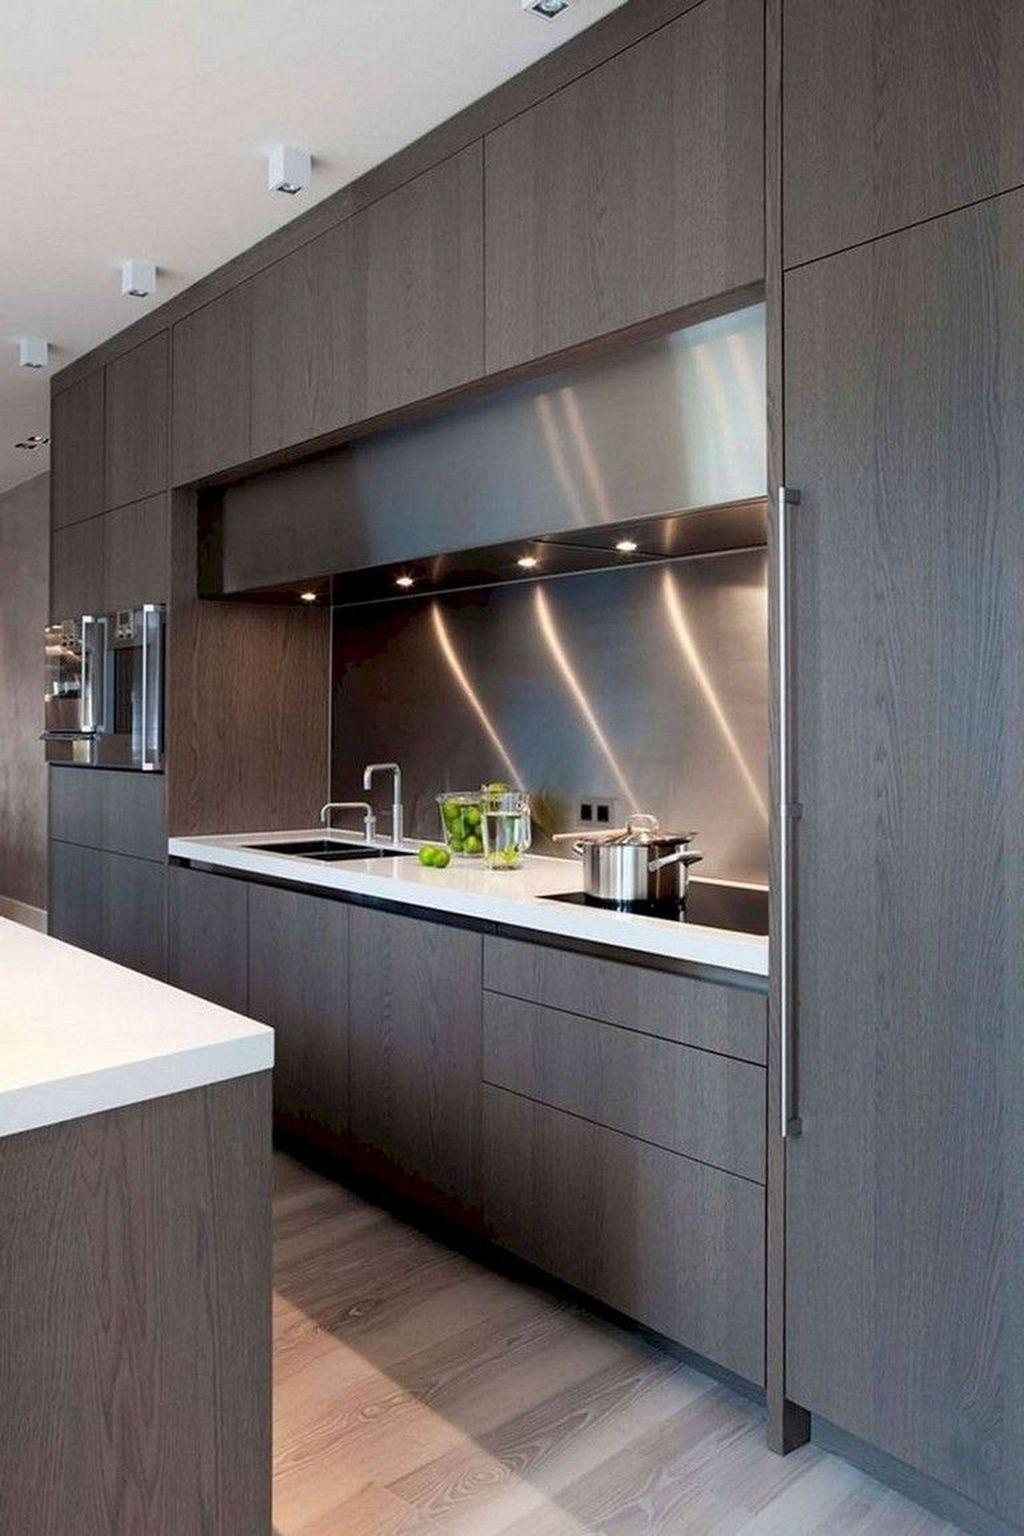 20 Impressive Kitchen Cabinet Design Ideas For Your Inspiration Kitchen Room Design Modern Kitchen Cabinet Design Contemporary Kitchen Cabinets